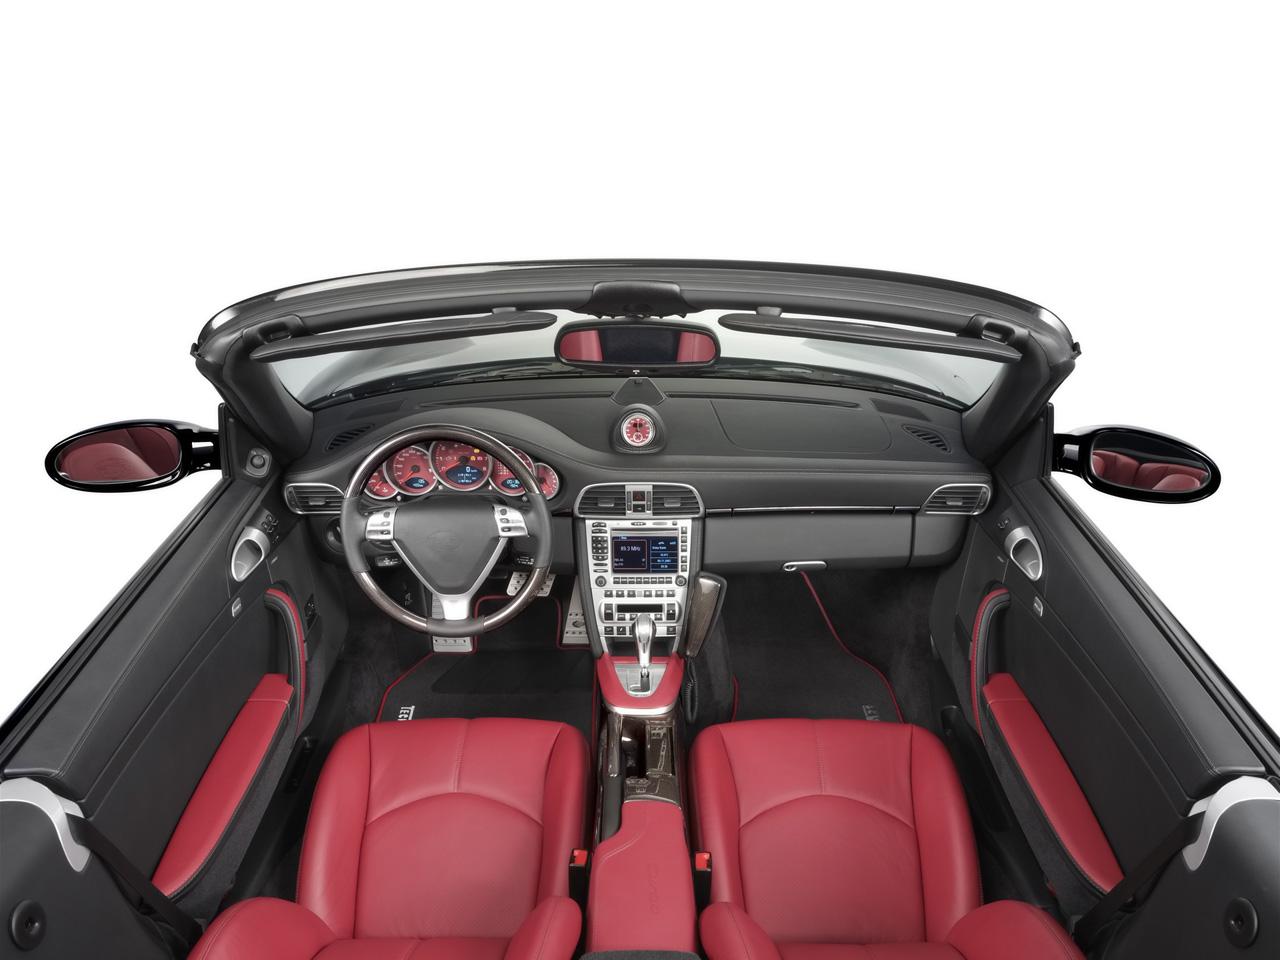 Porsche 911 Turbo Cabriolet Tip-tronic